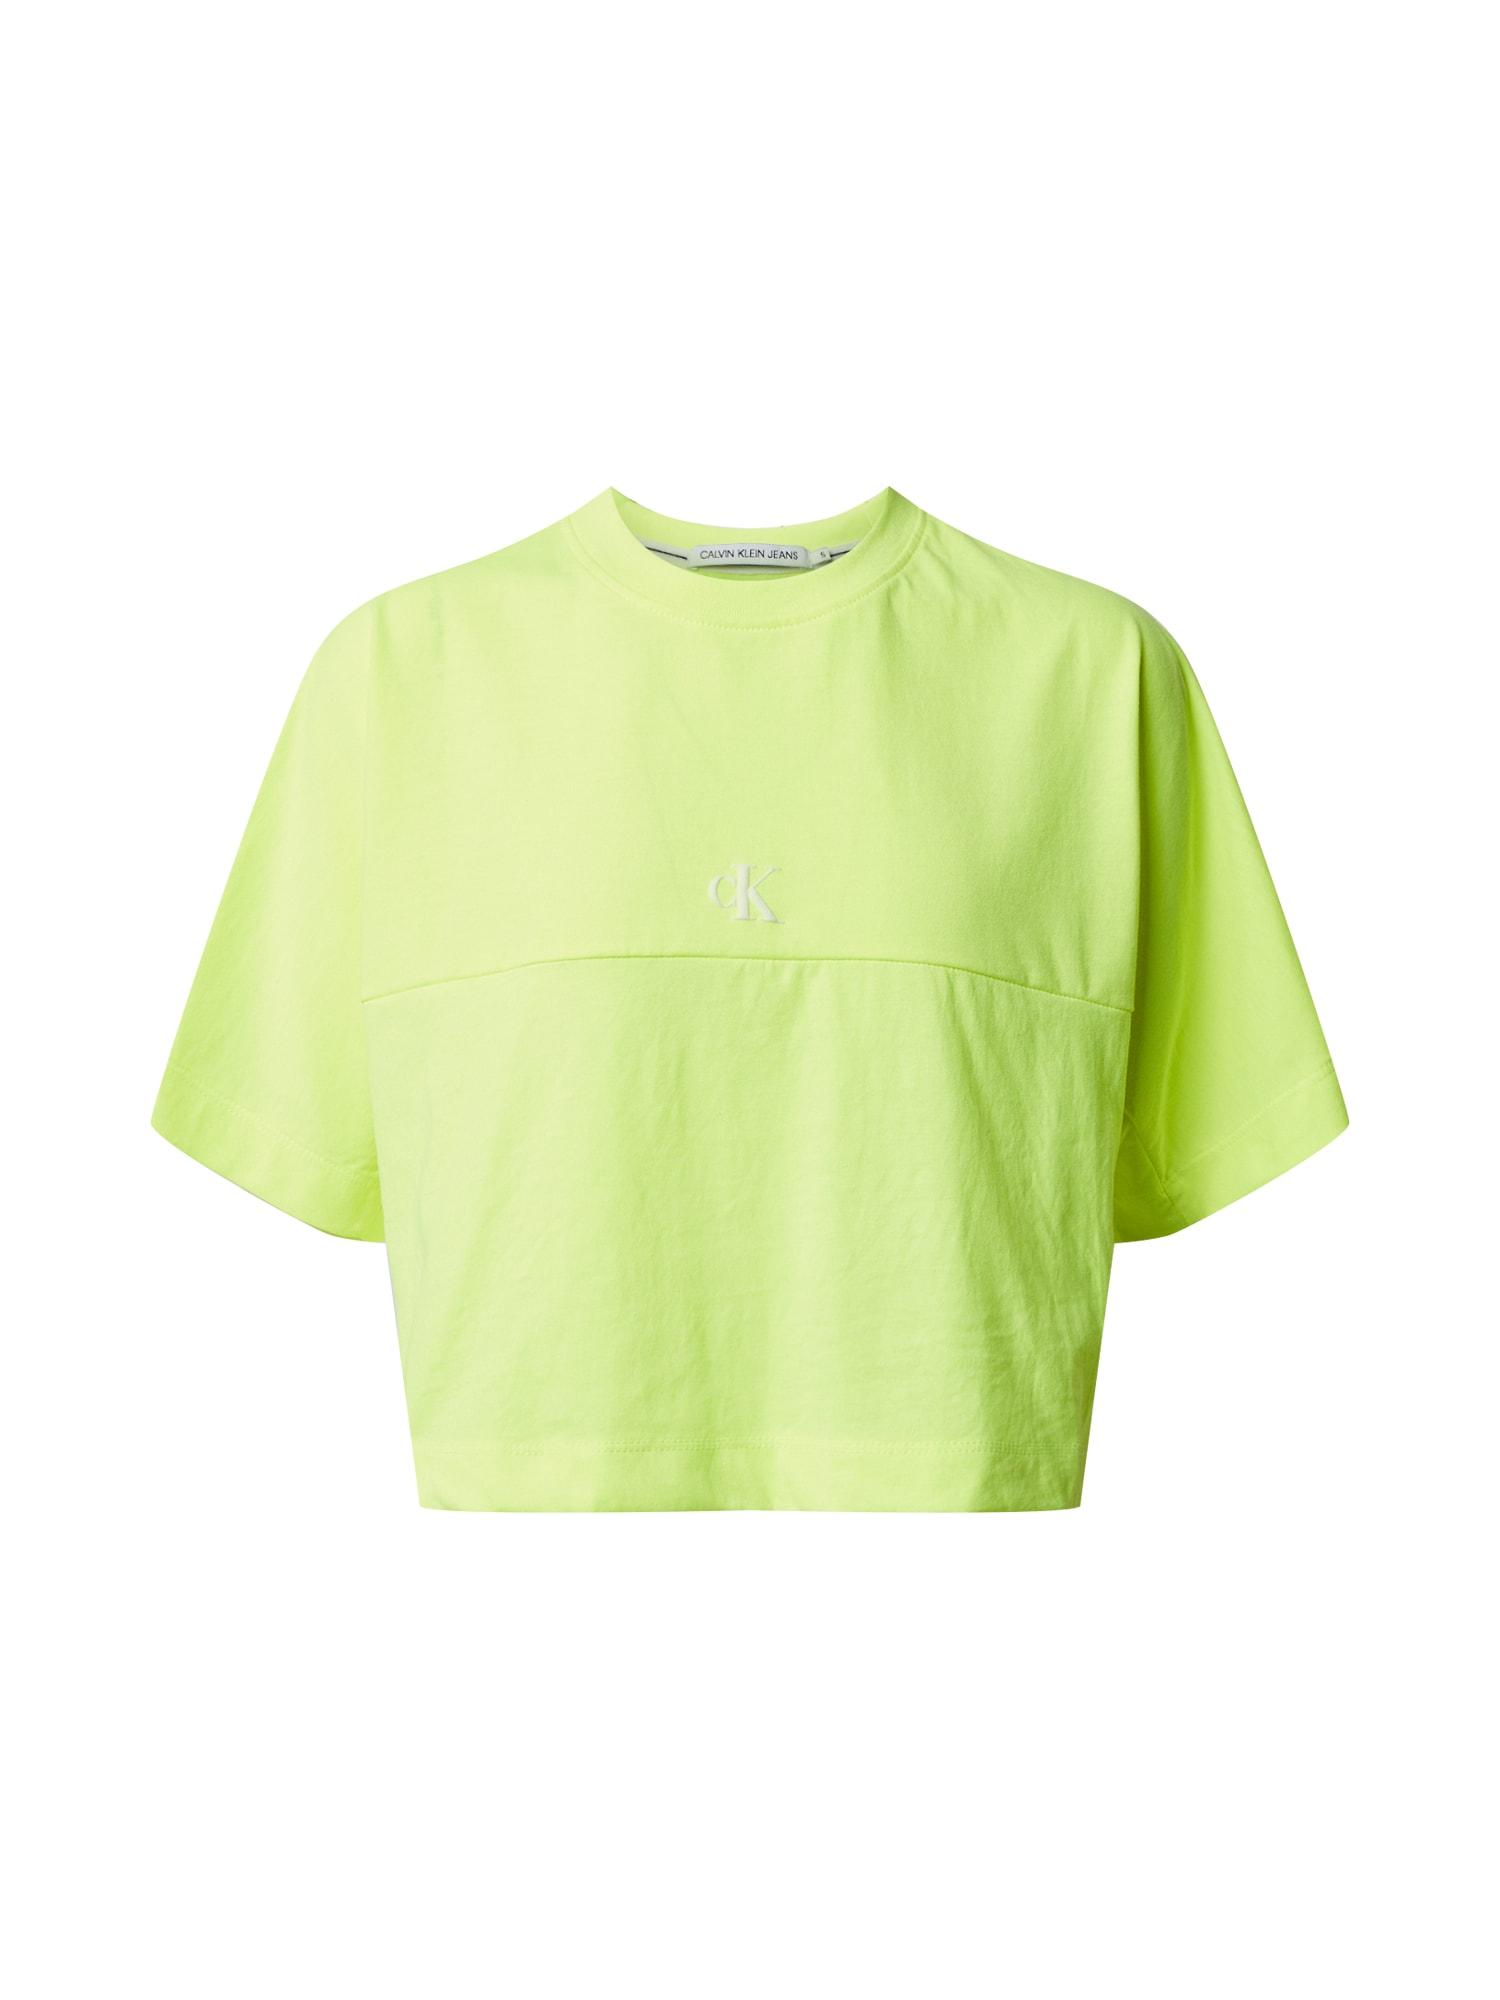 Calvin Klein Jeans Marškinėliai 'PUFF PRINT BACK LOGO T-SHIRT' geltona